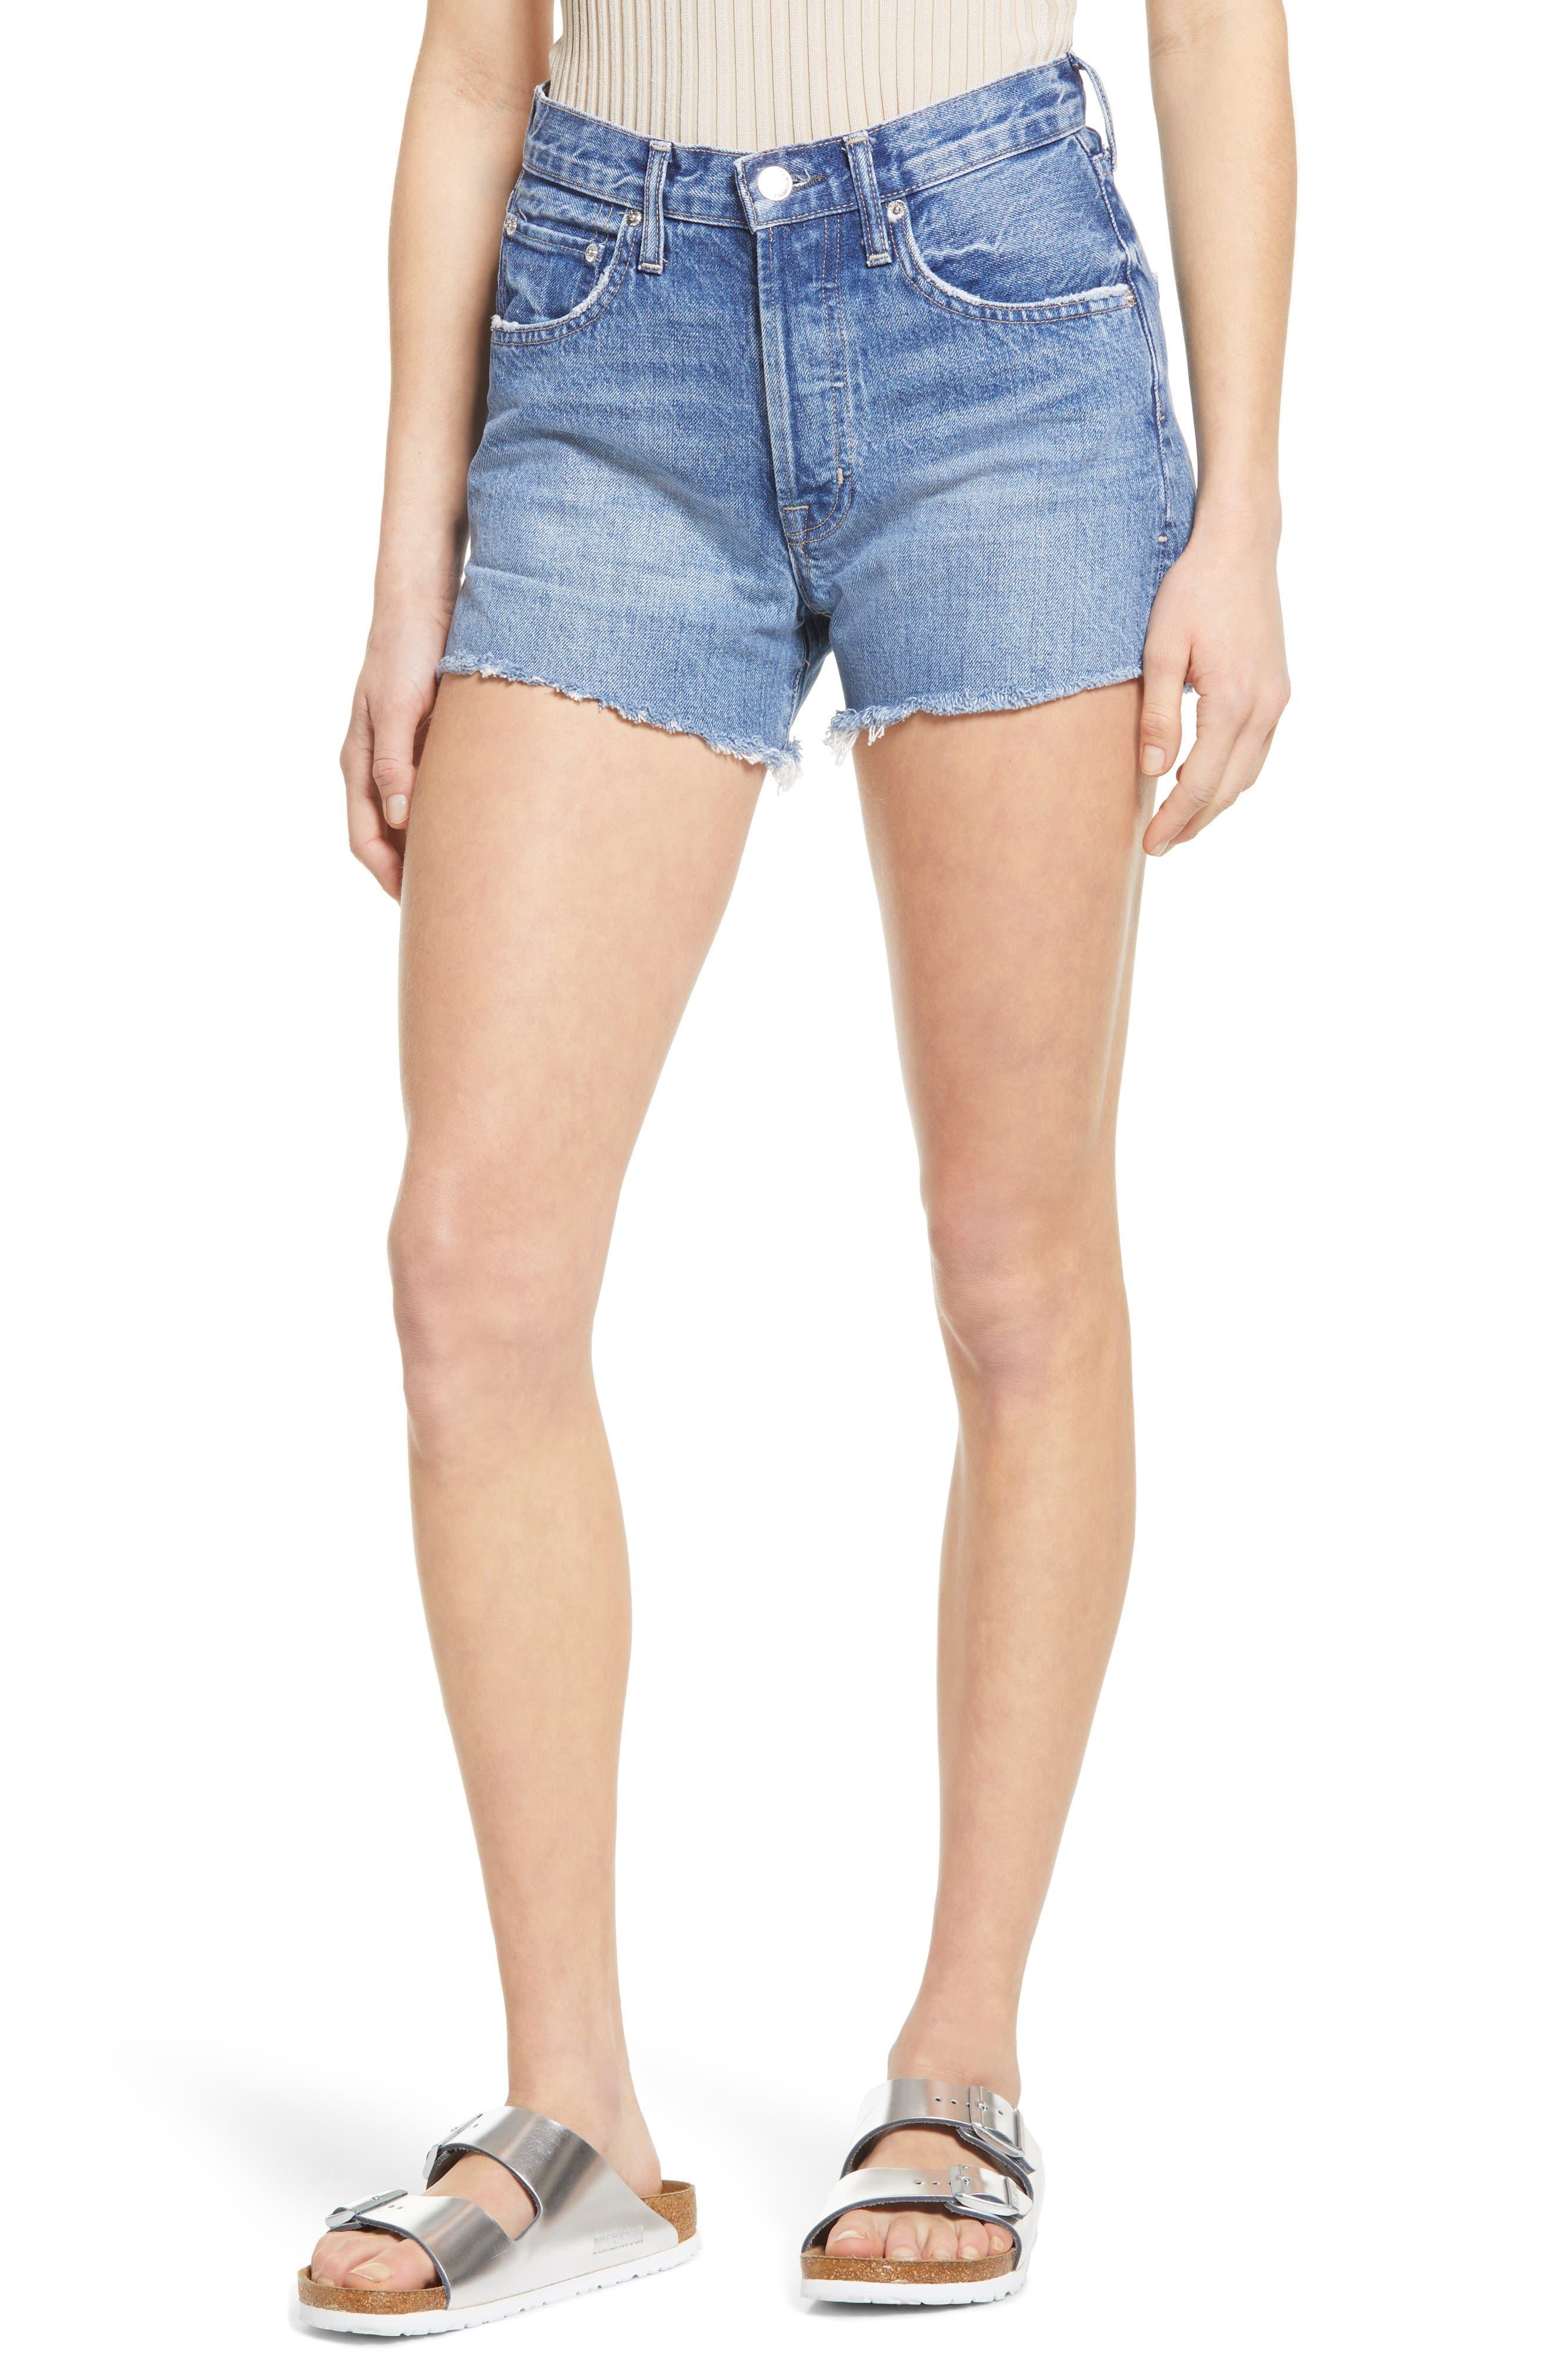 Cai High Waist Distressed Denim Cutoff Shorts